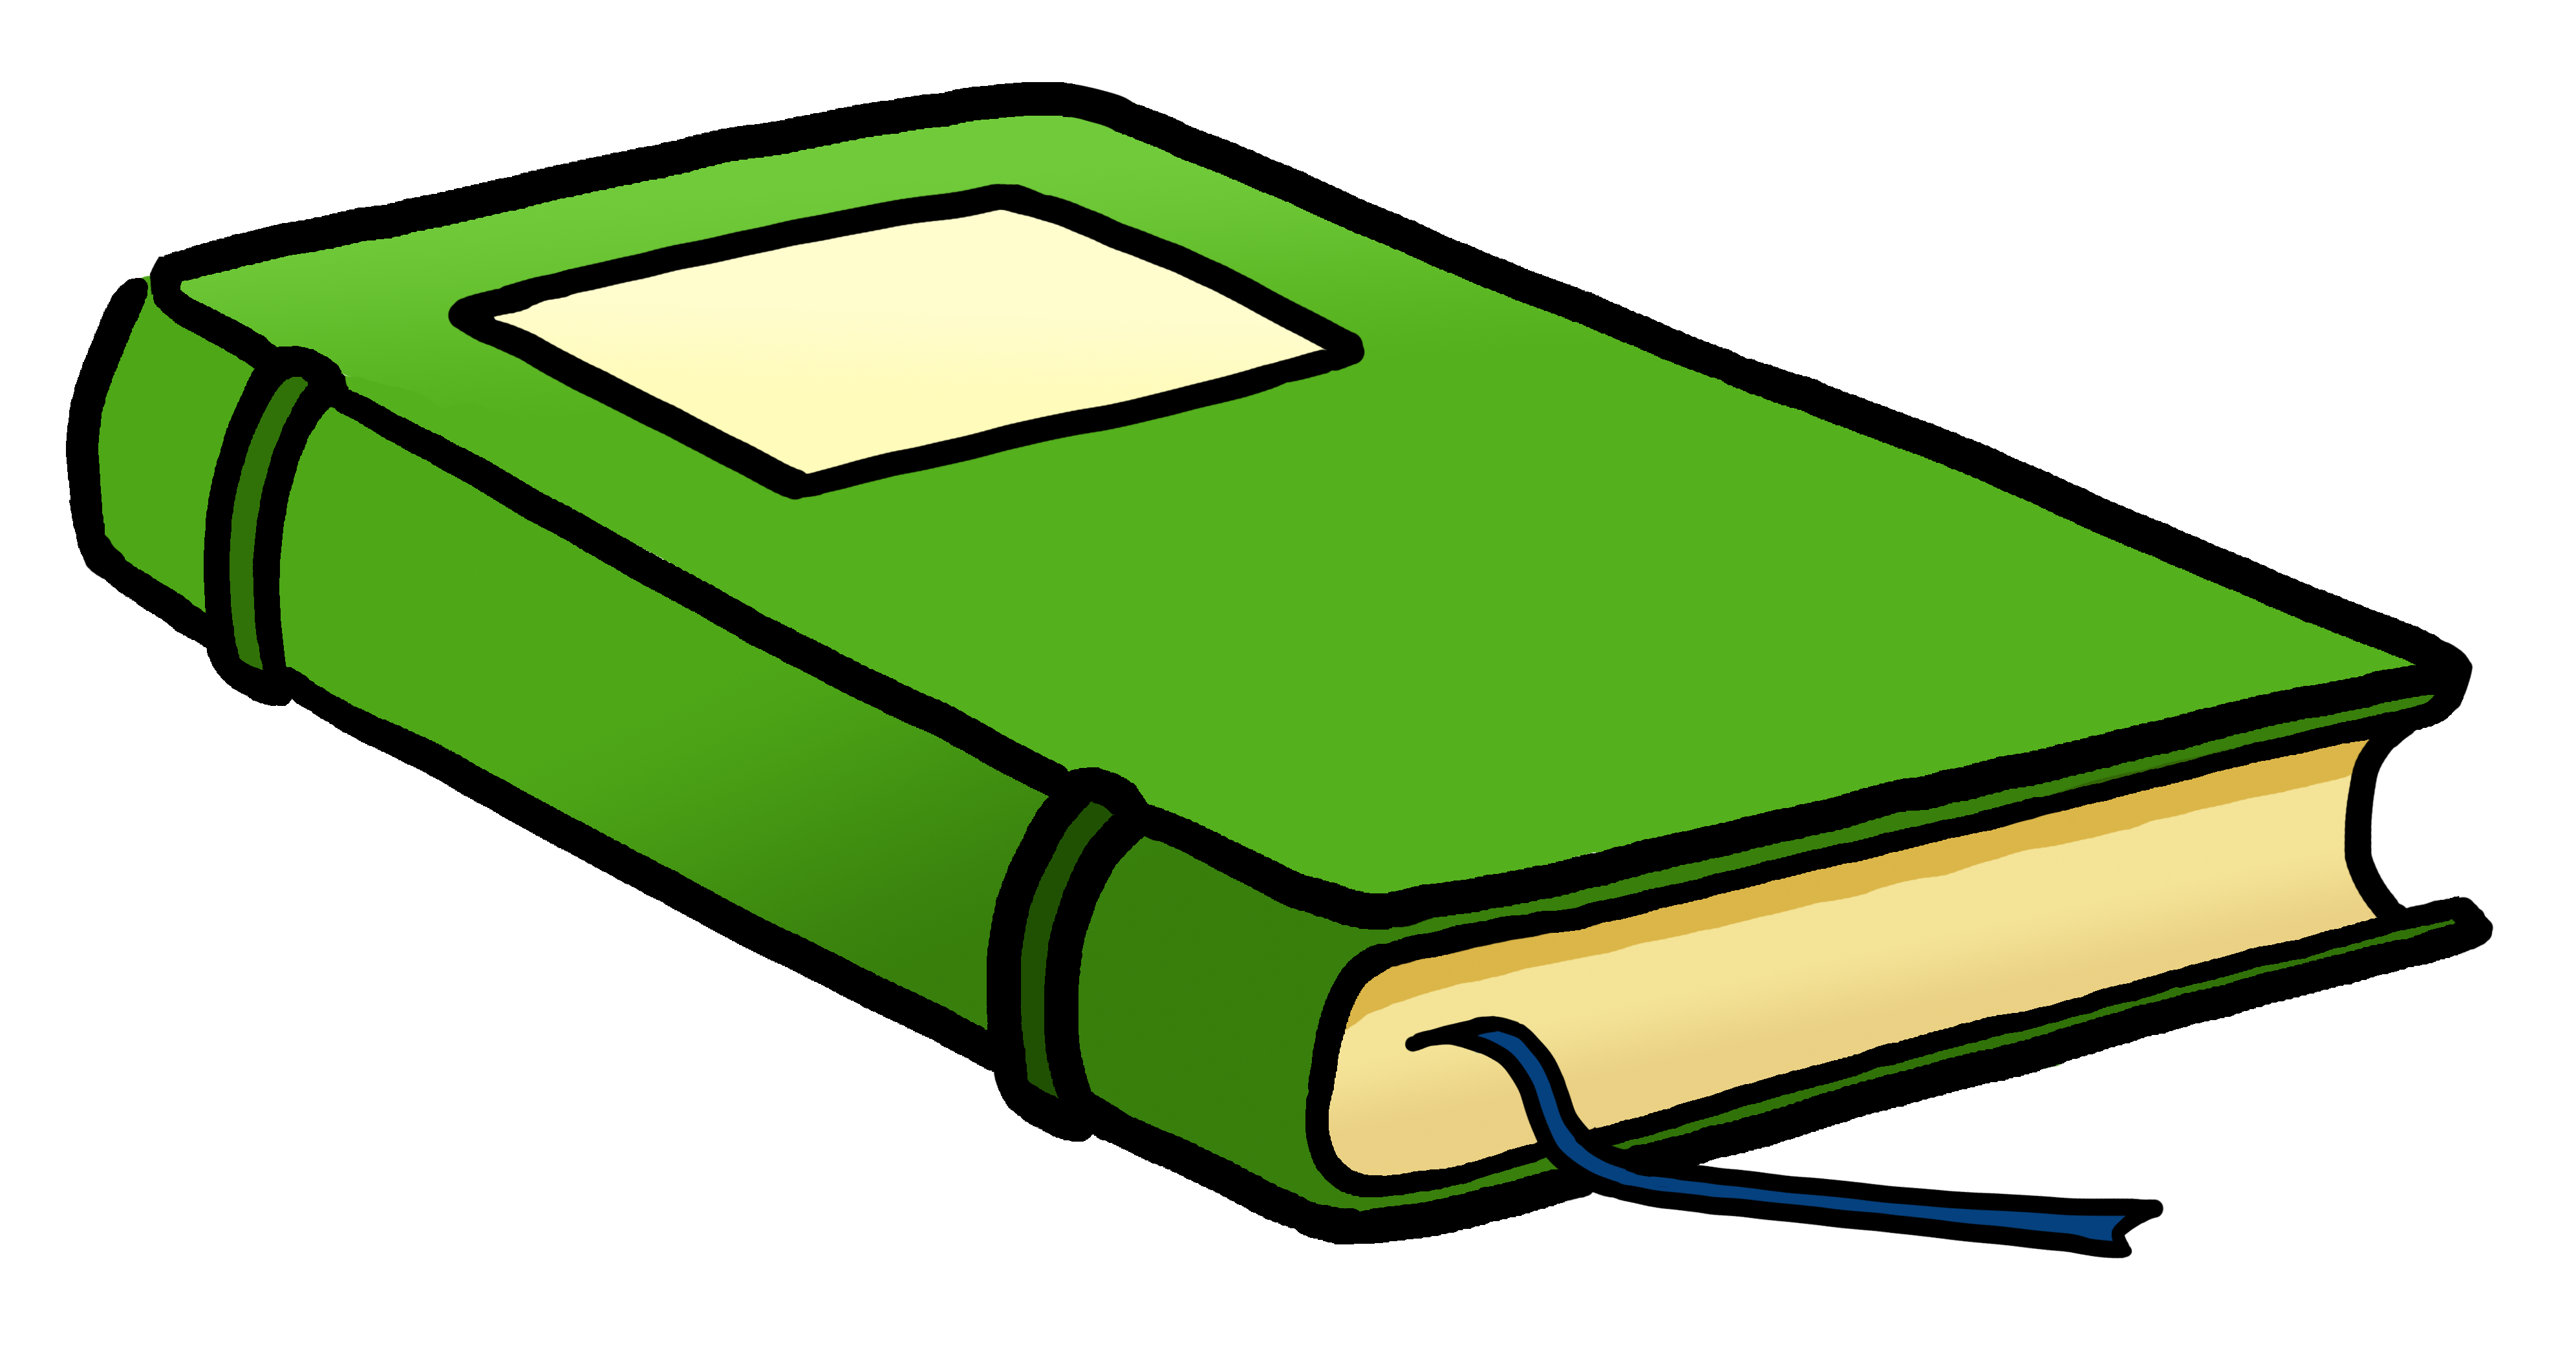 Book Clip Art-Book Clip Art-2